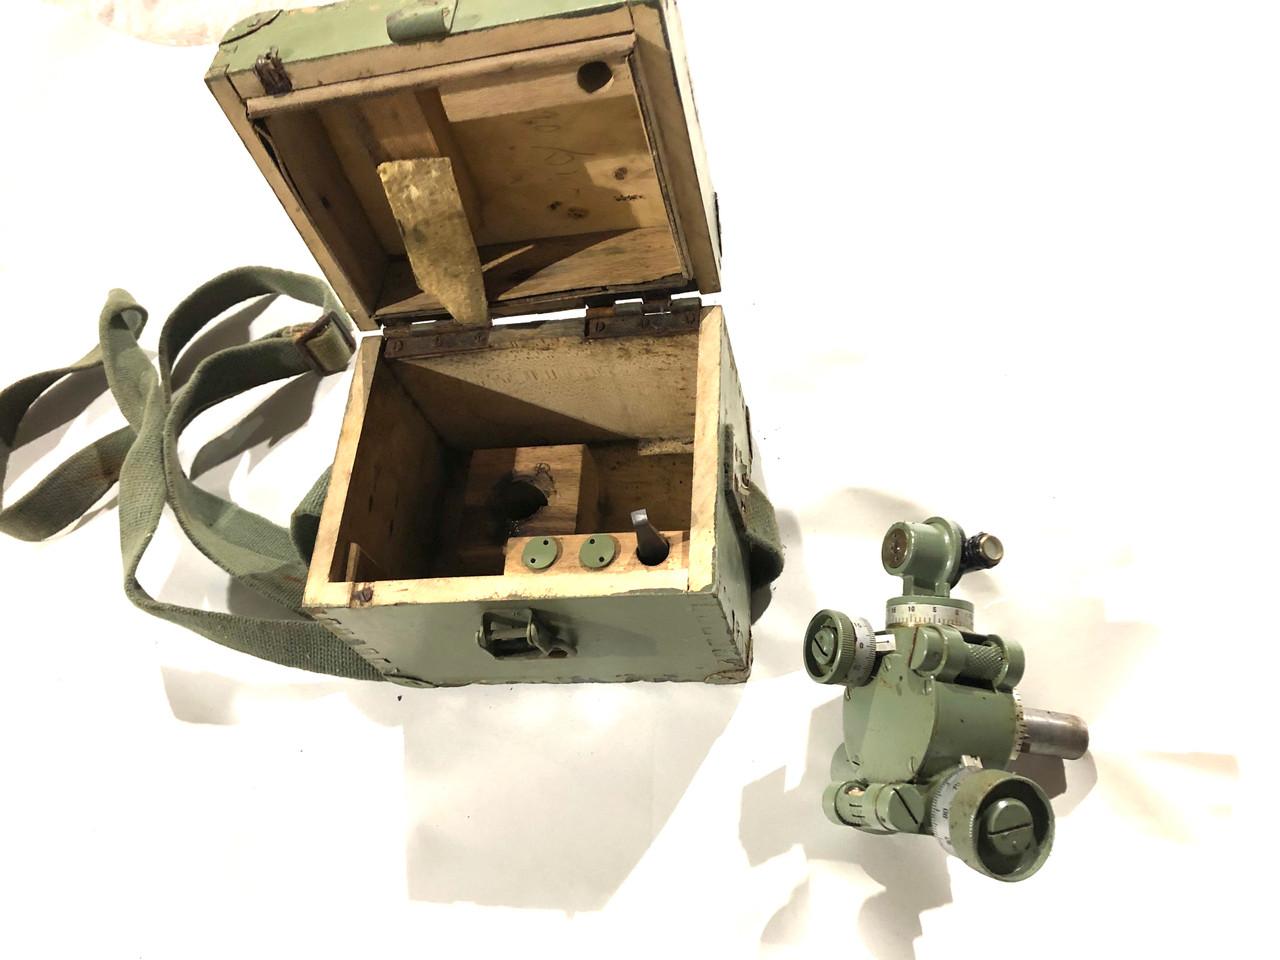 NSB-1 Yugo Mortar Sight  - Low Grade Condition